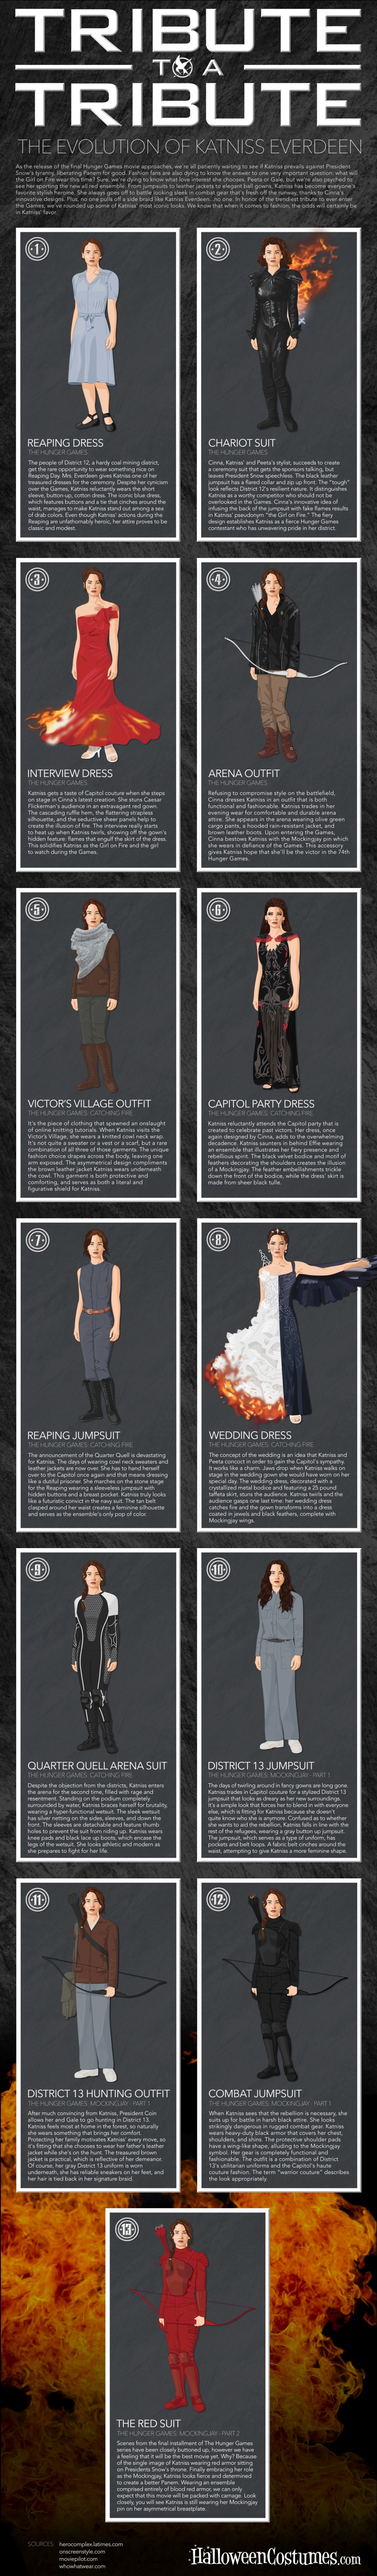 Katniss-Evolution